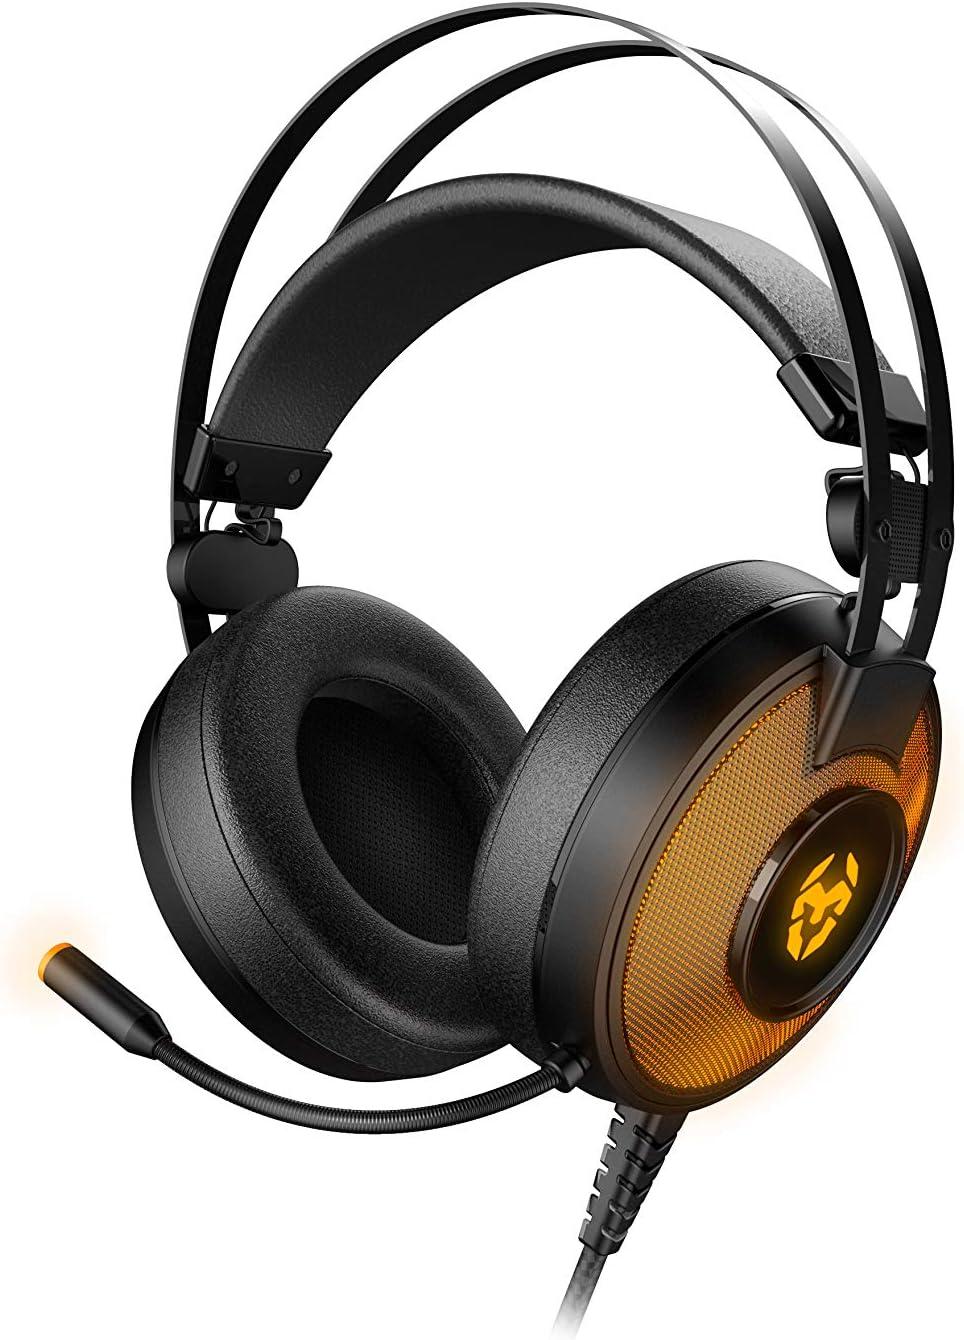 KROM Kayle - NXKROMKAYLE - Auricular Gaming, 7.1, RGB, Color Negro